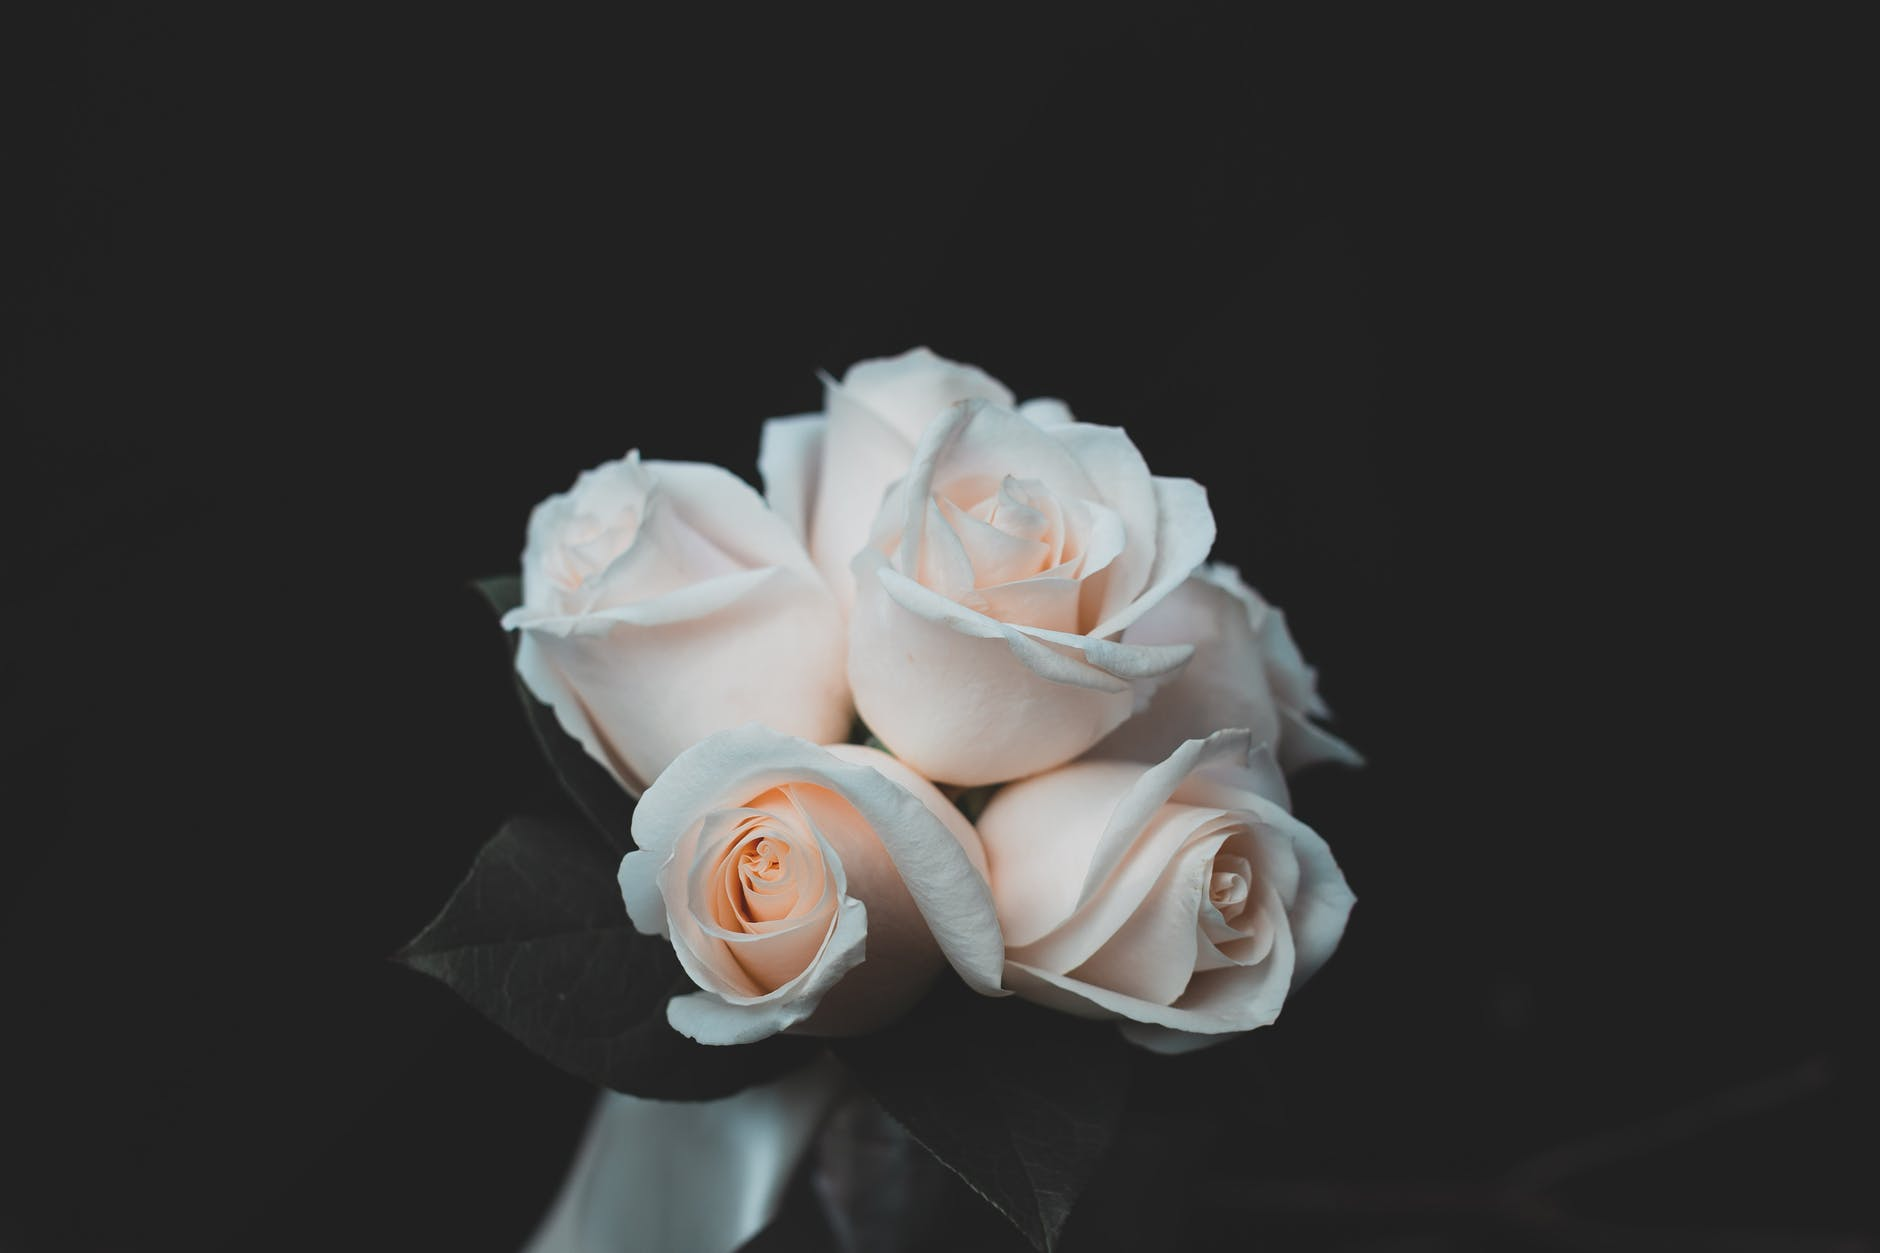 gambar bunga mawar hitam putih yang cantik